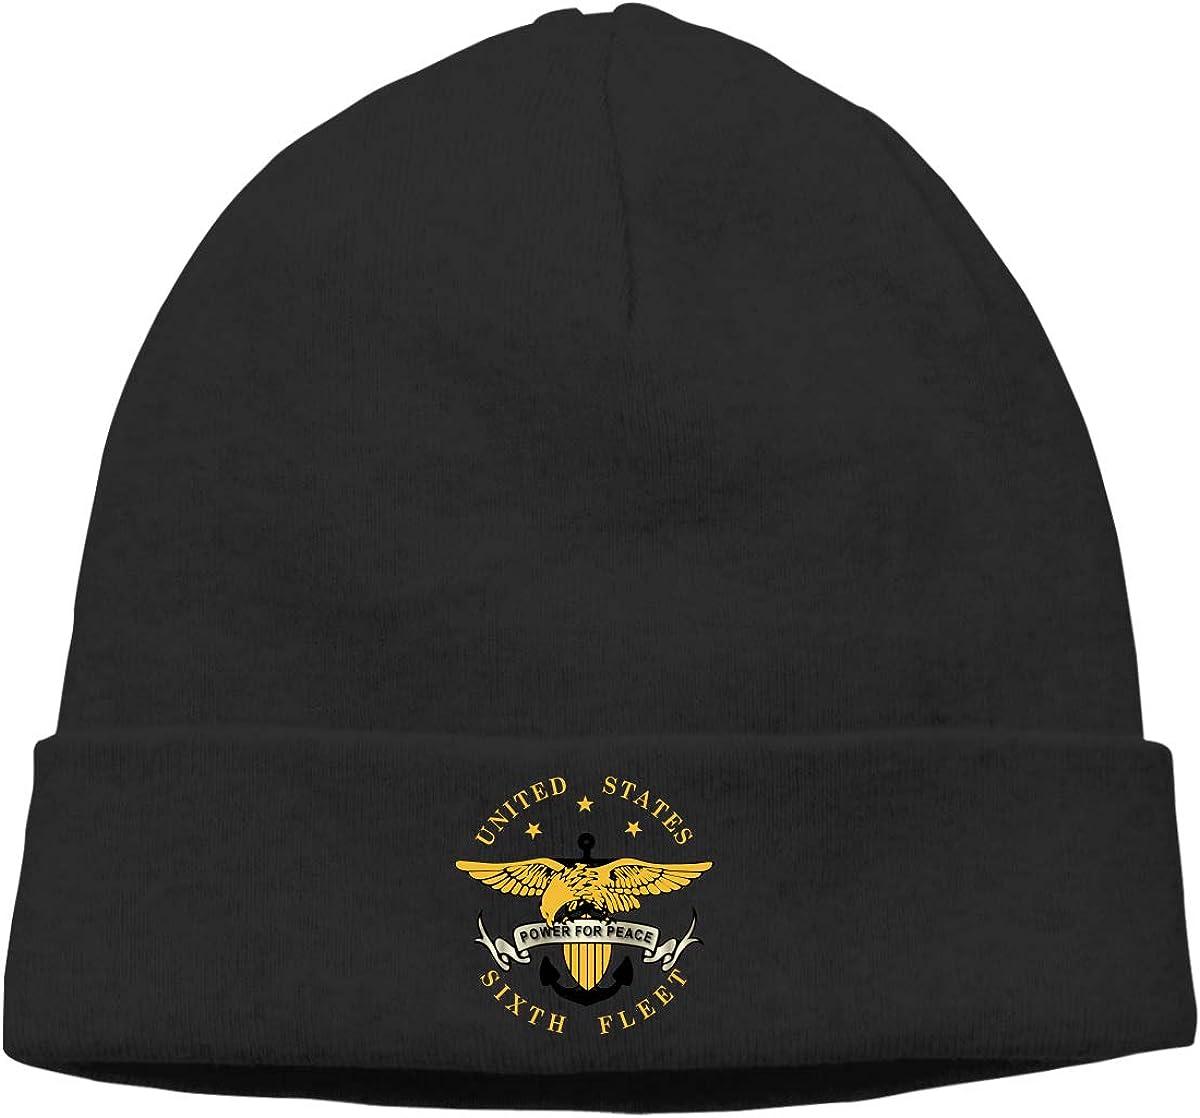 Lapptty Cap Navy Sixth Fleet Men Women Beanie Hat Knitted Beanie Knit Beanie